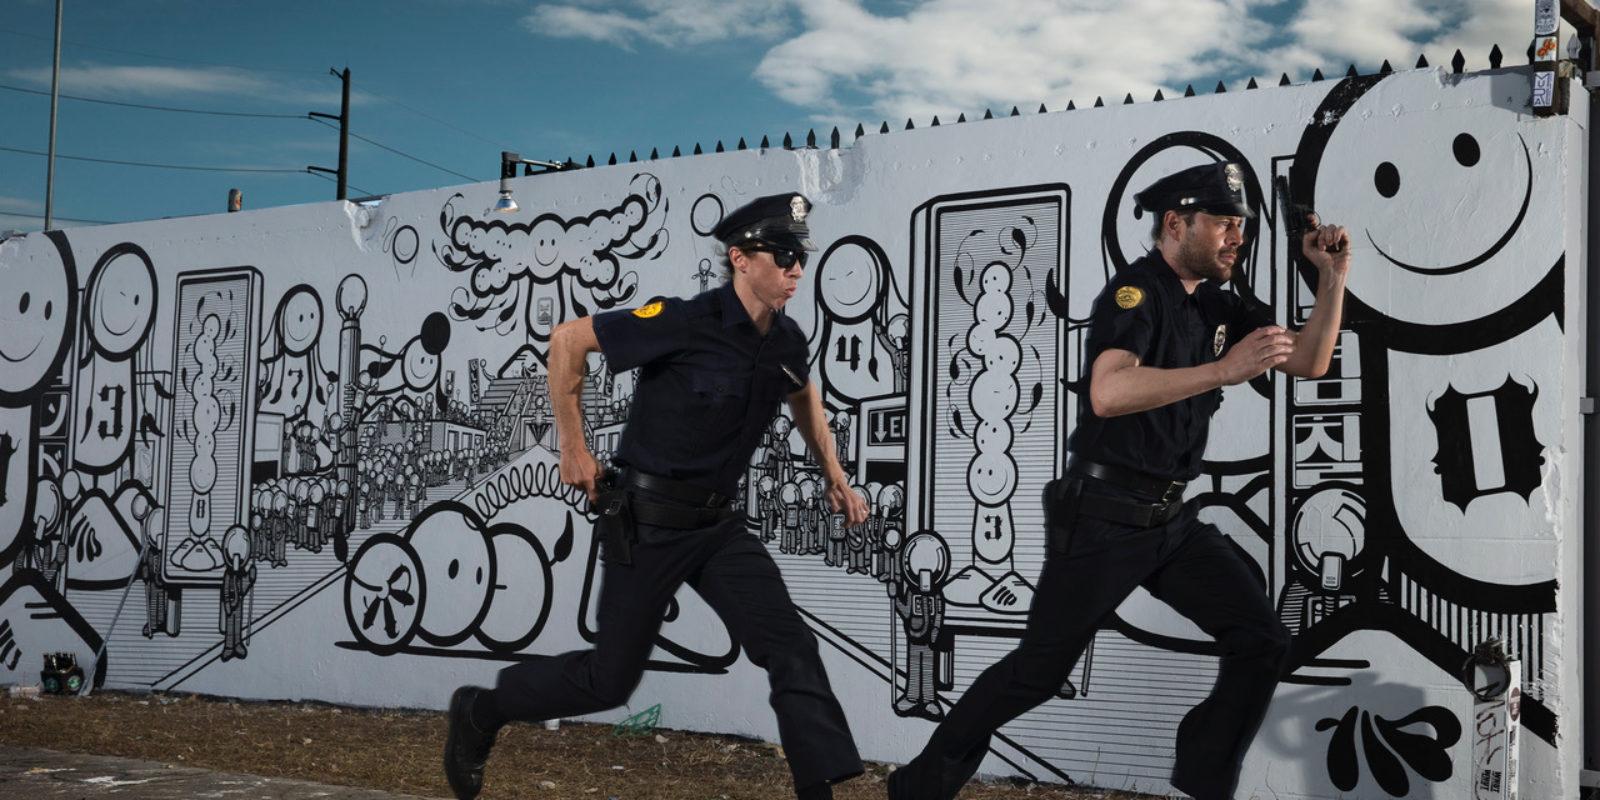 LONDON POLICE soren solkaer